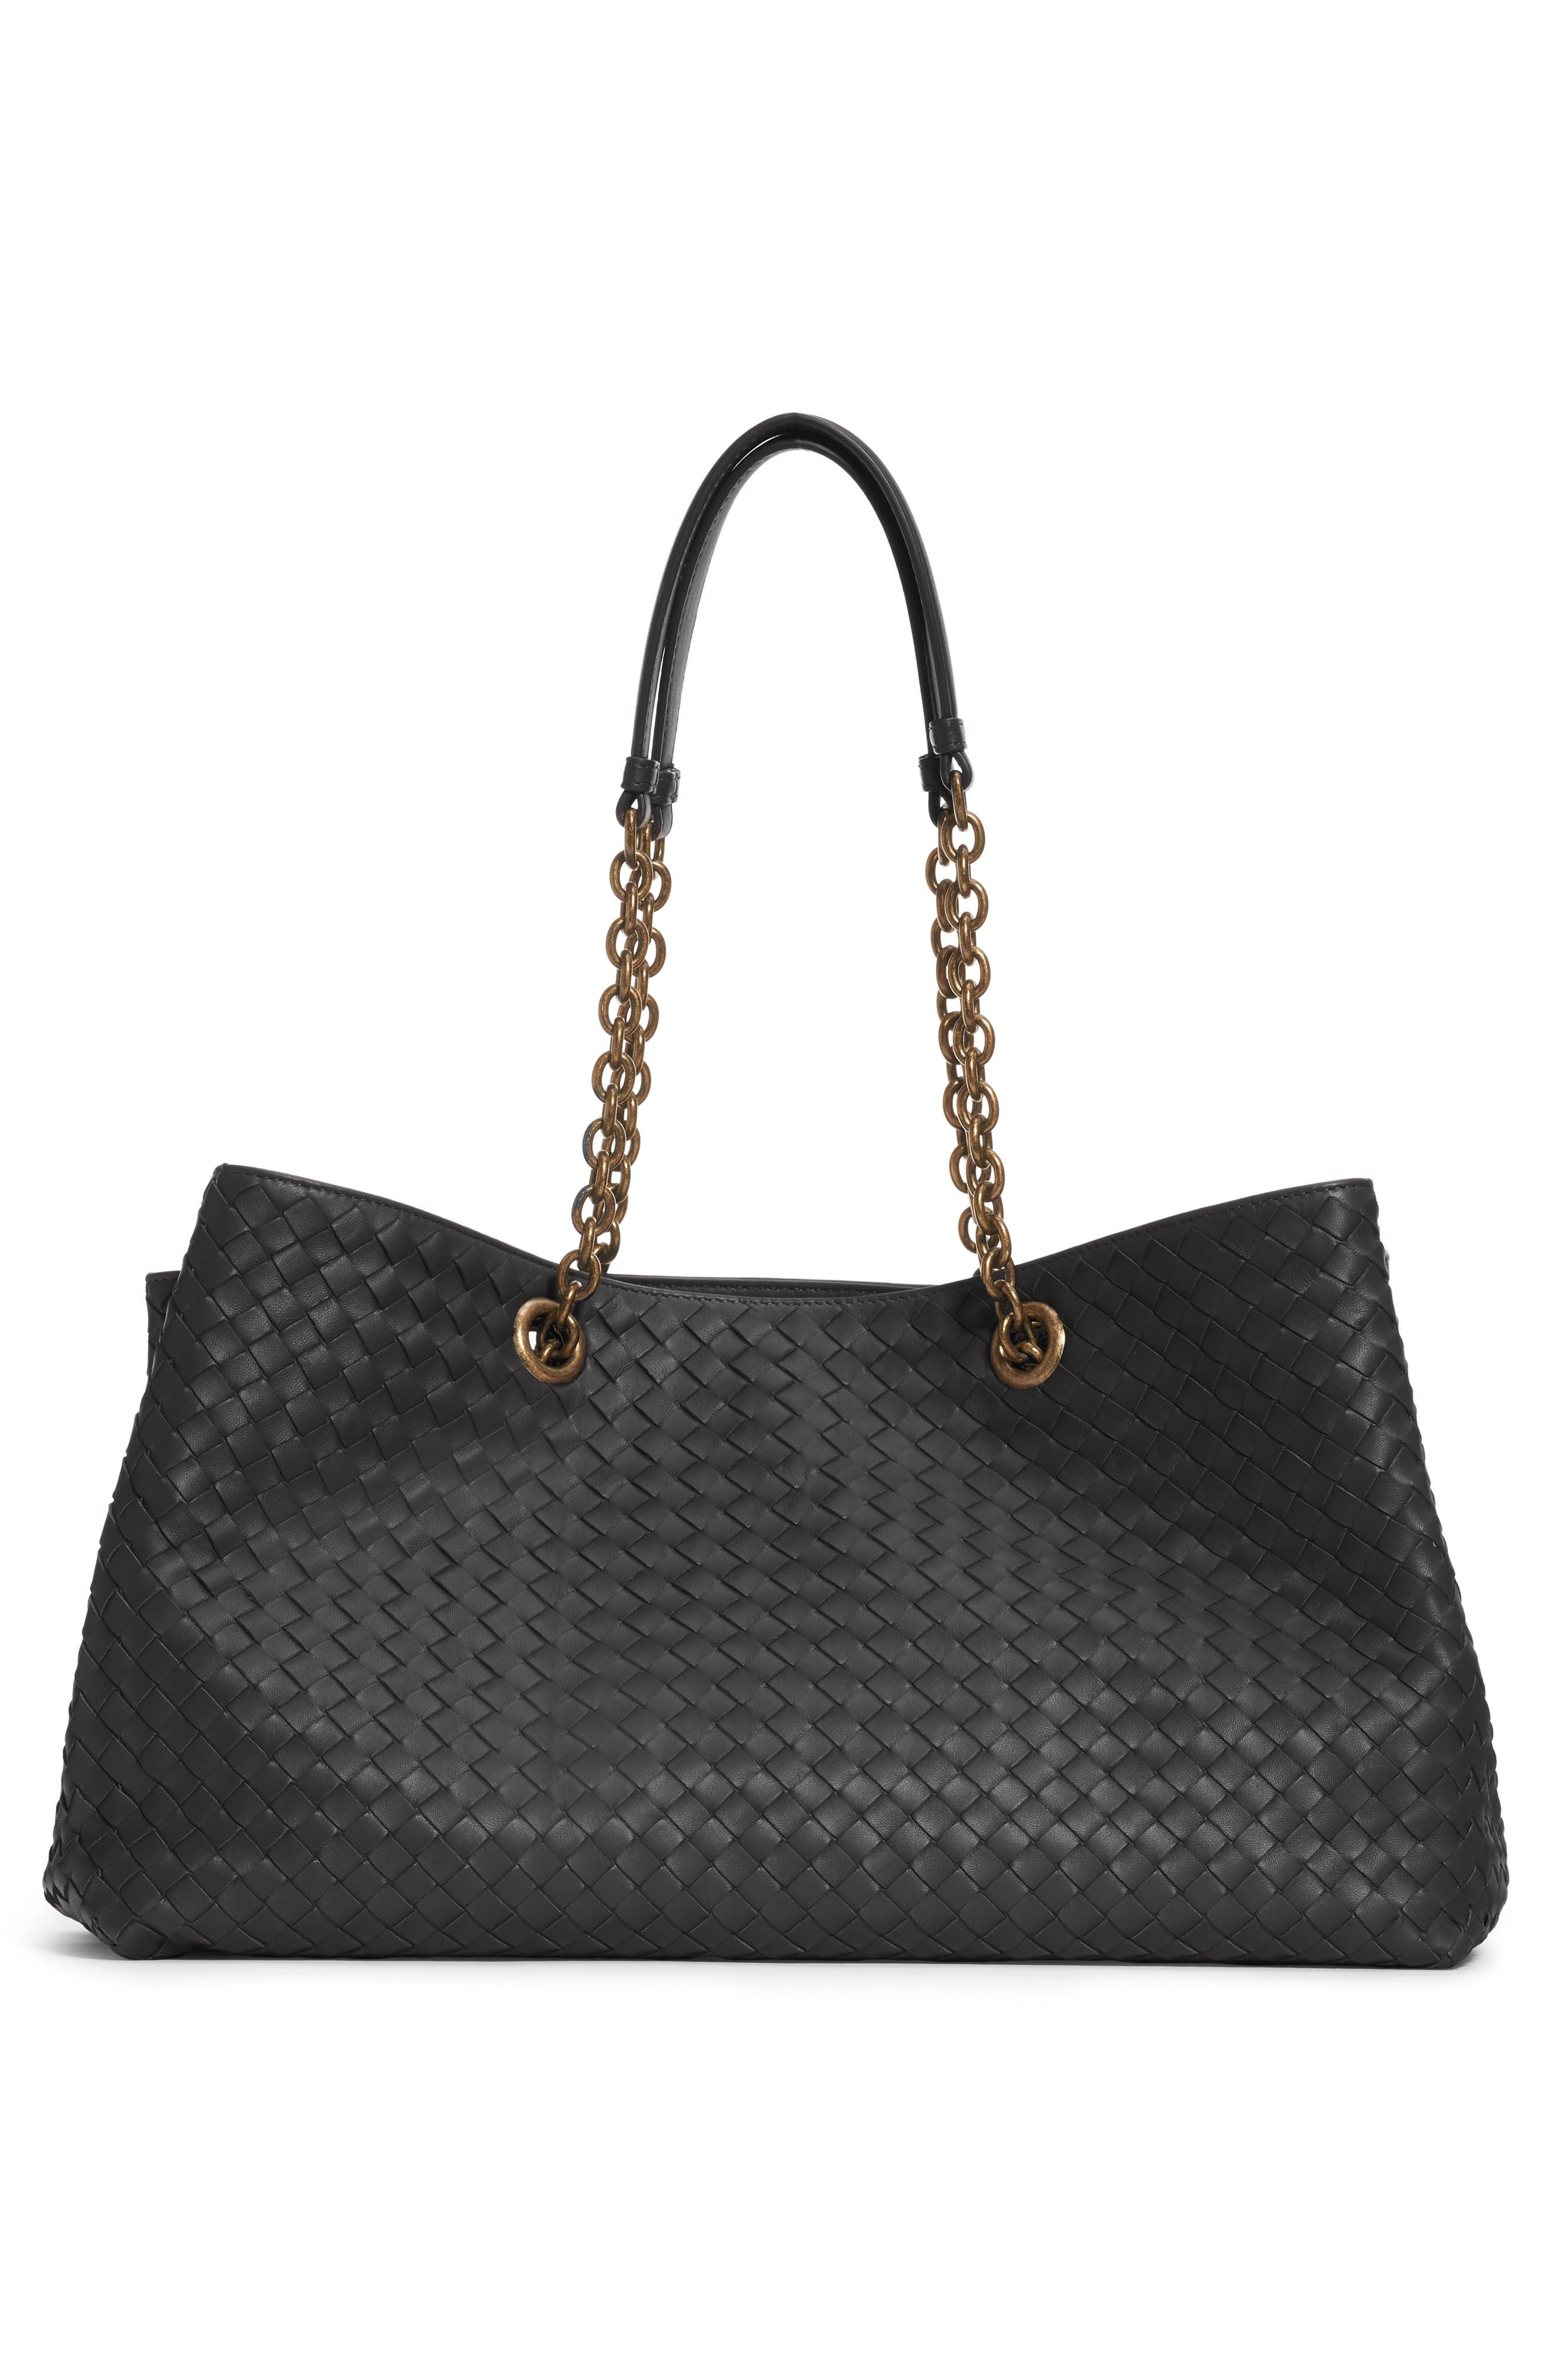 35fa3b4233d7 Bottega Veneta Tote Bags for Women  Leather